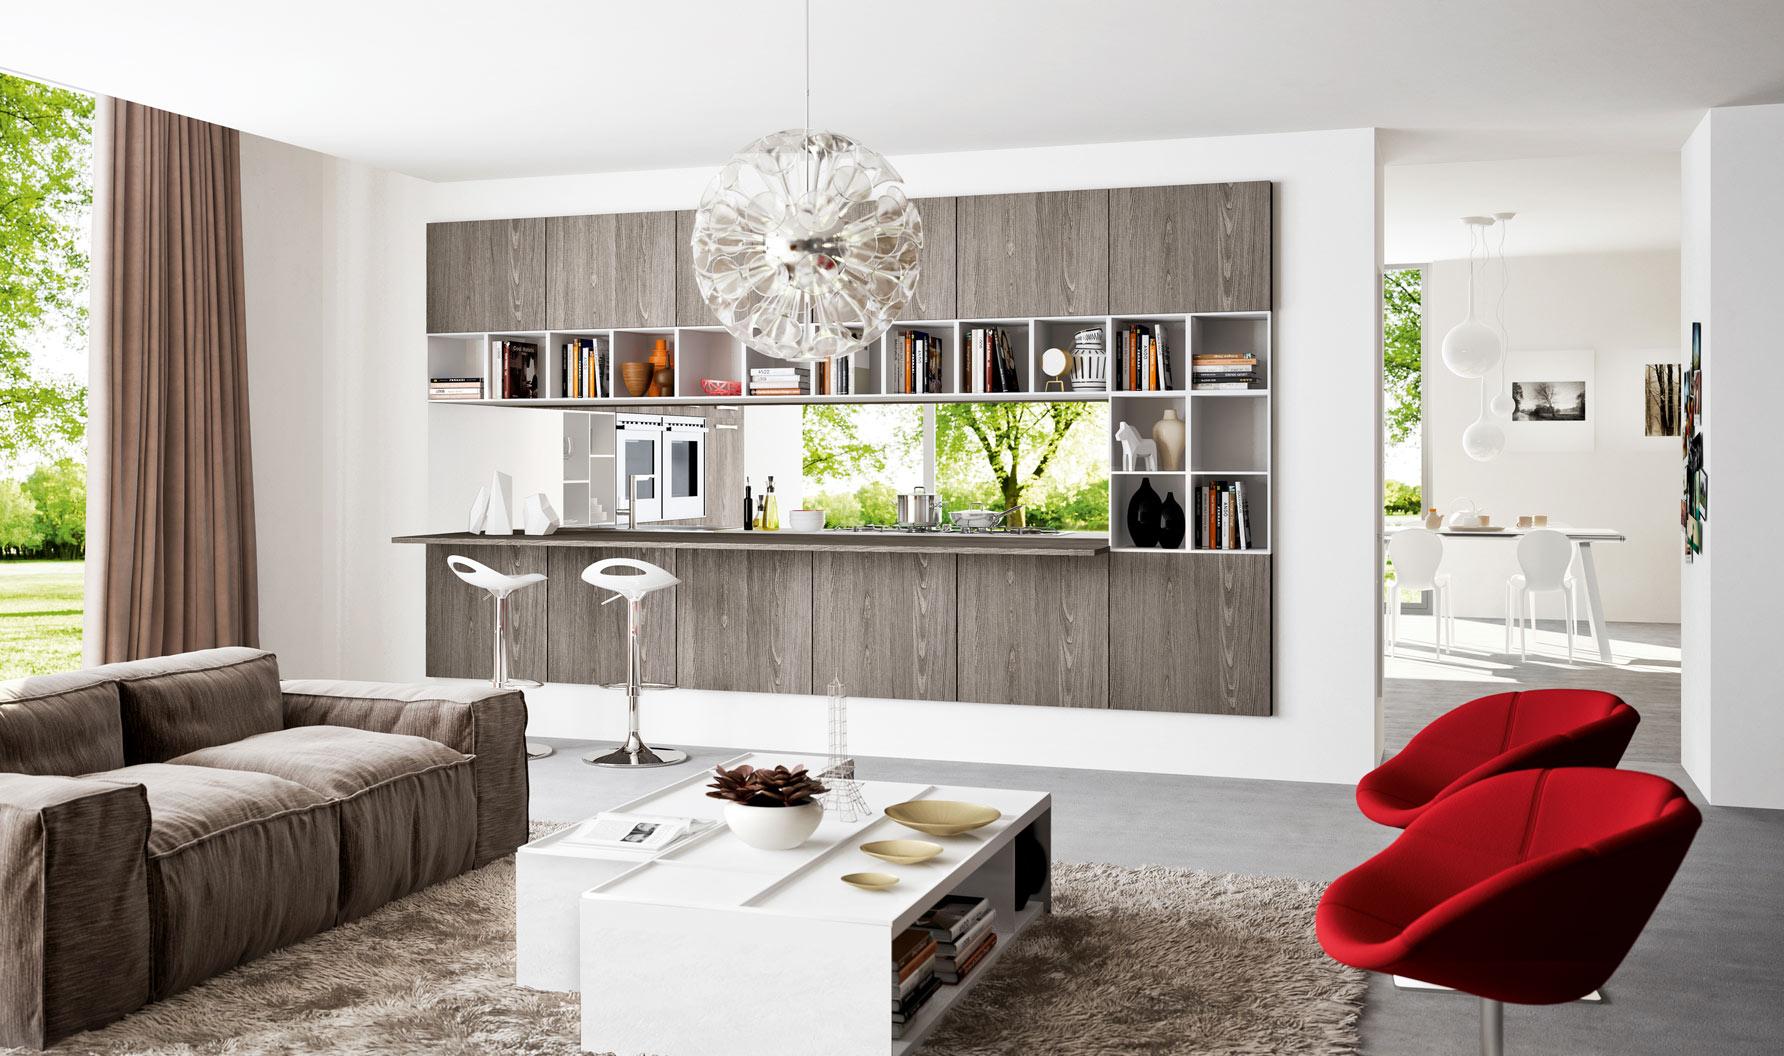 Kitchen designs that pop - Kitchen and living room divider ...